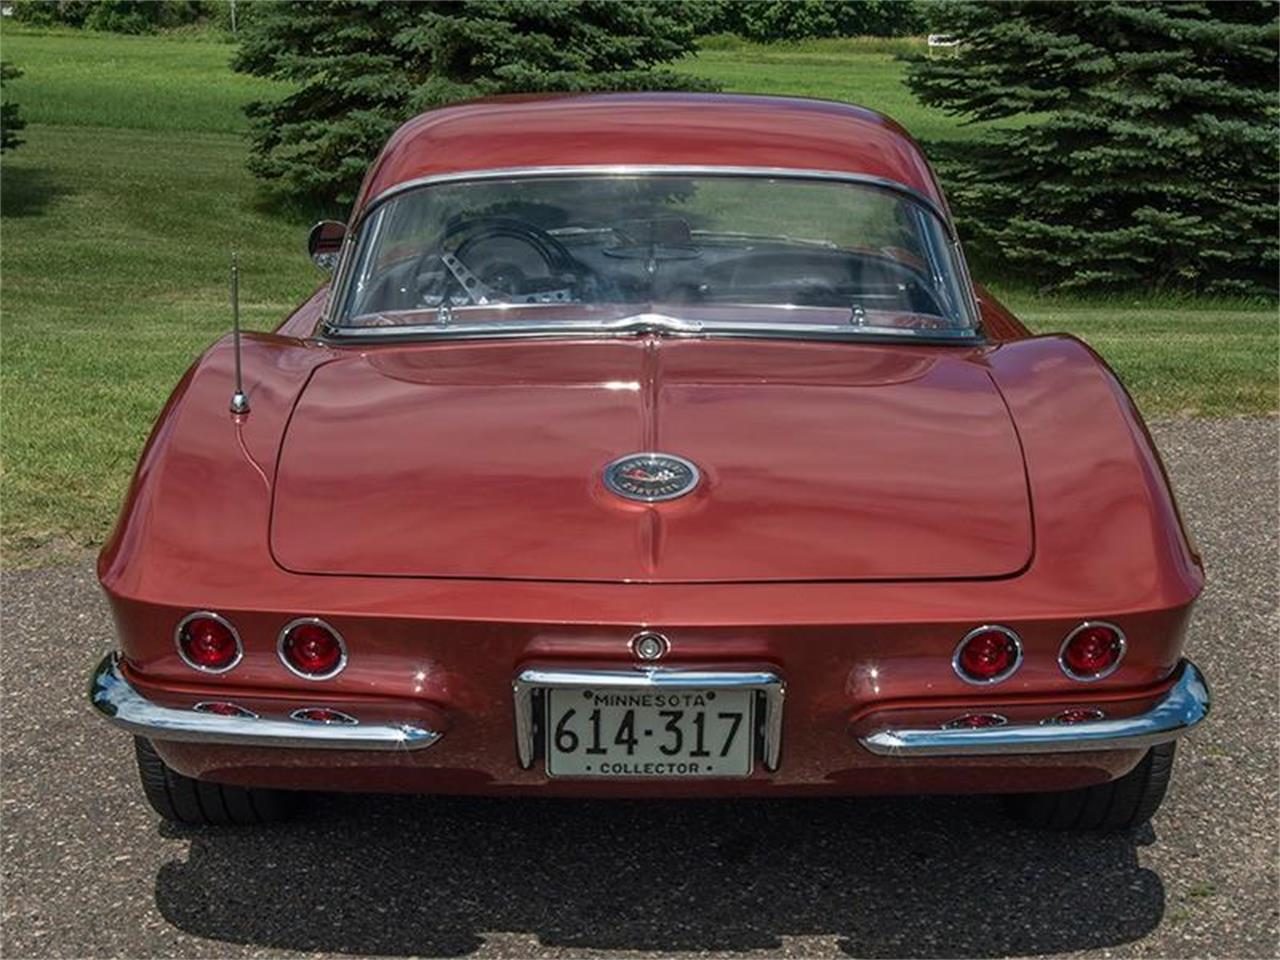 Large Picture of '62 Chevrolet Corvette - $54,950.00 - LHPM